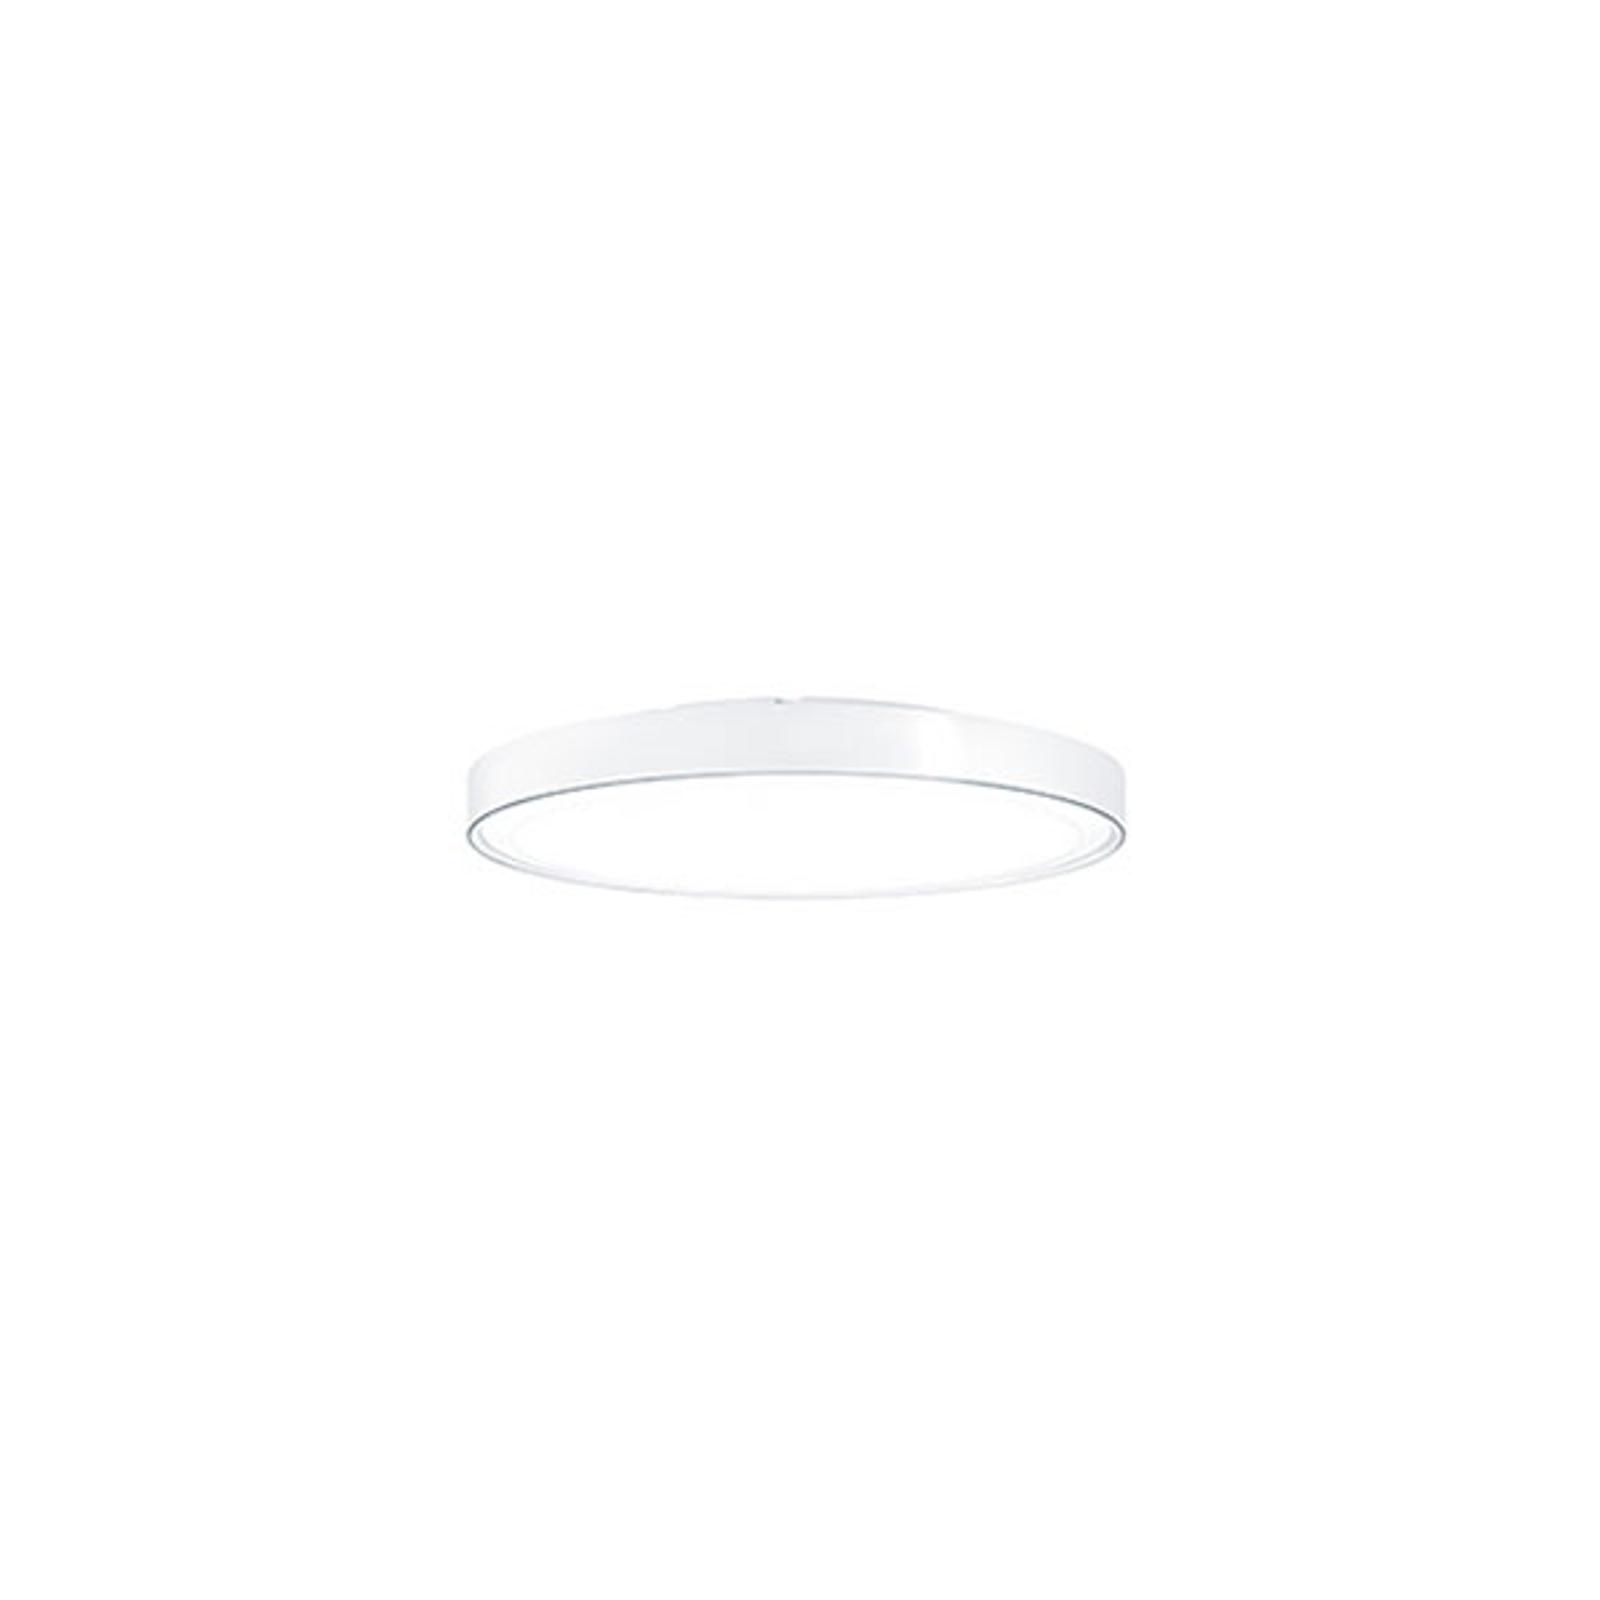 Zumtobel Ondaria II Deckenlampe weiß 59cm 3.000K